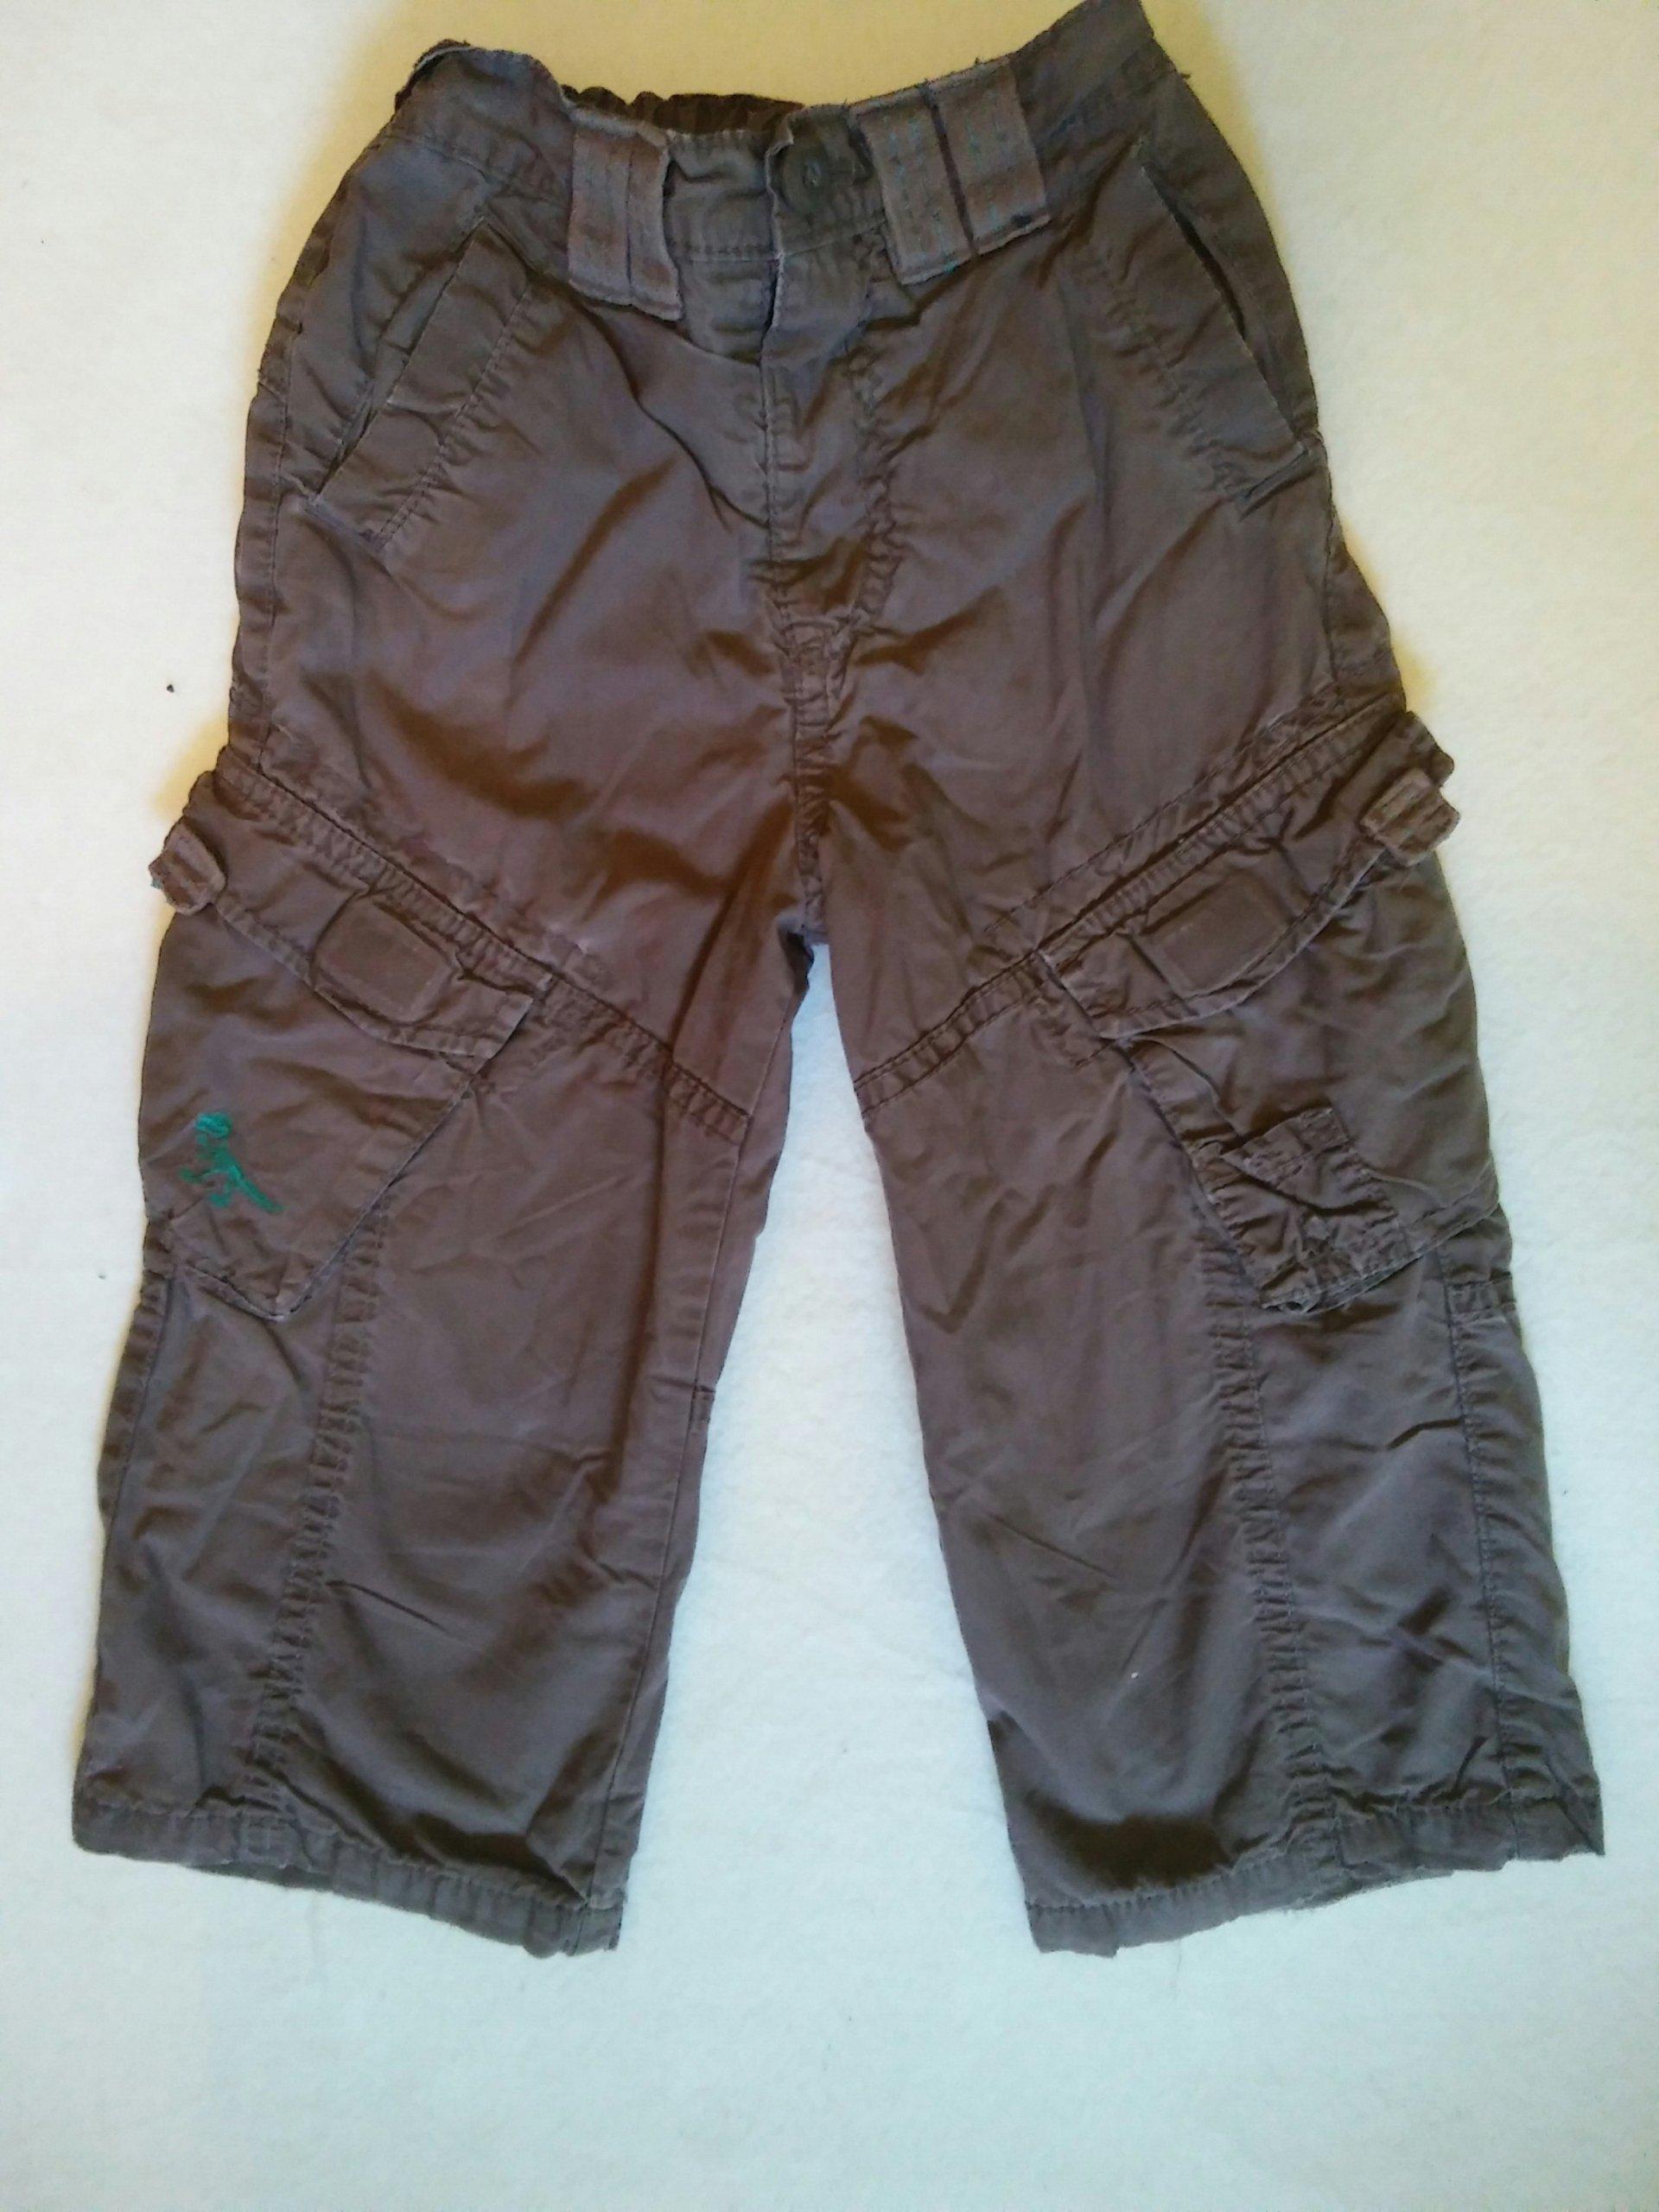 spodnie rozmiar 86 - 92 . George